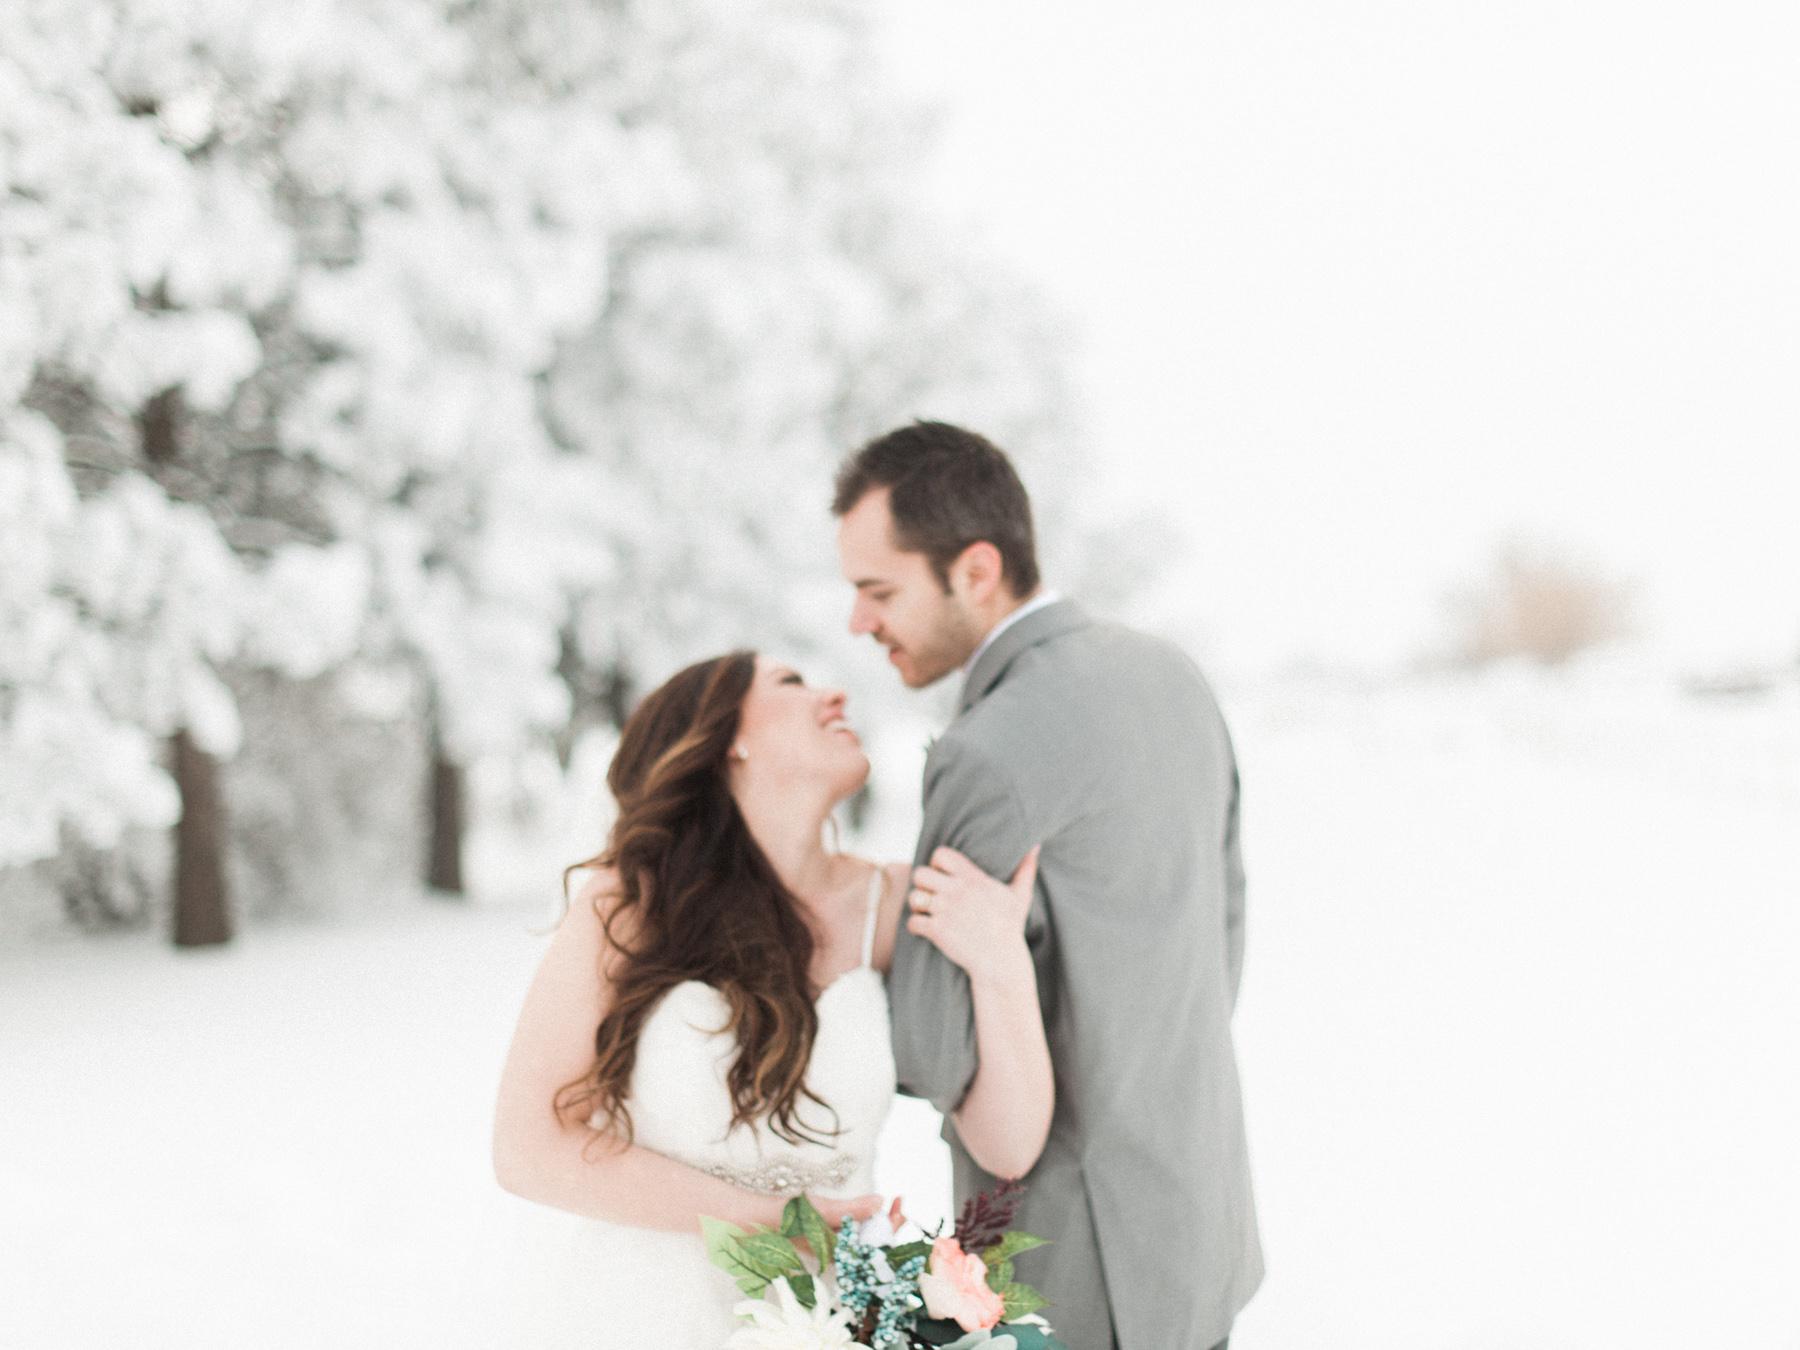 Ben+Joella | Jacob+Alana Wedding01.jpg